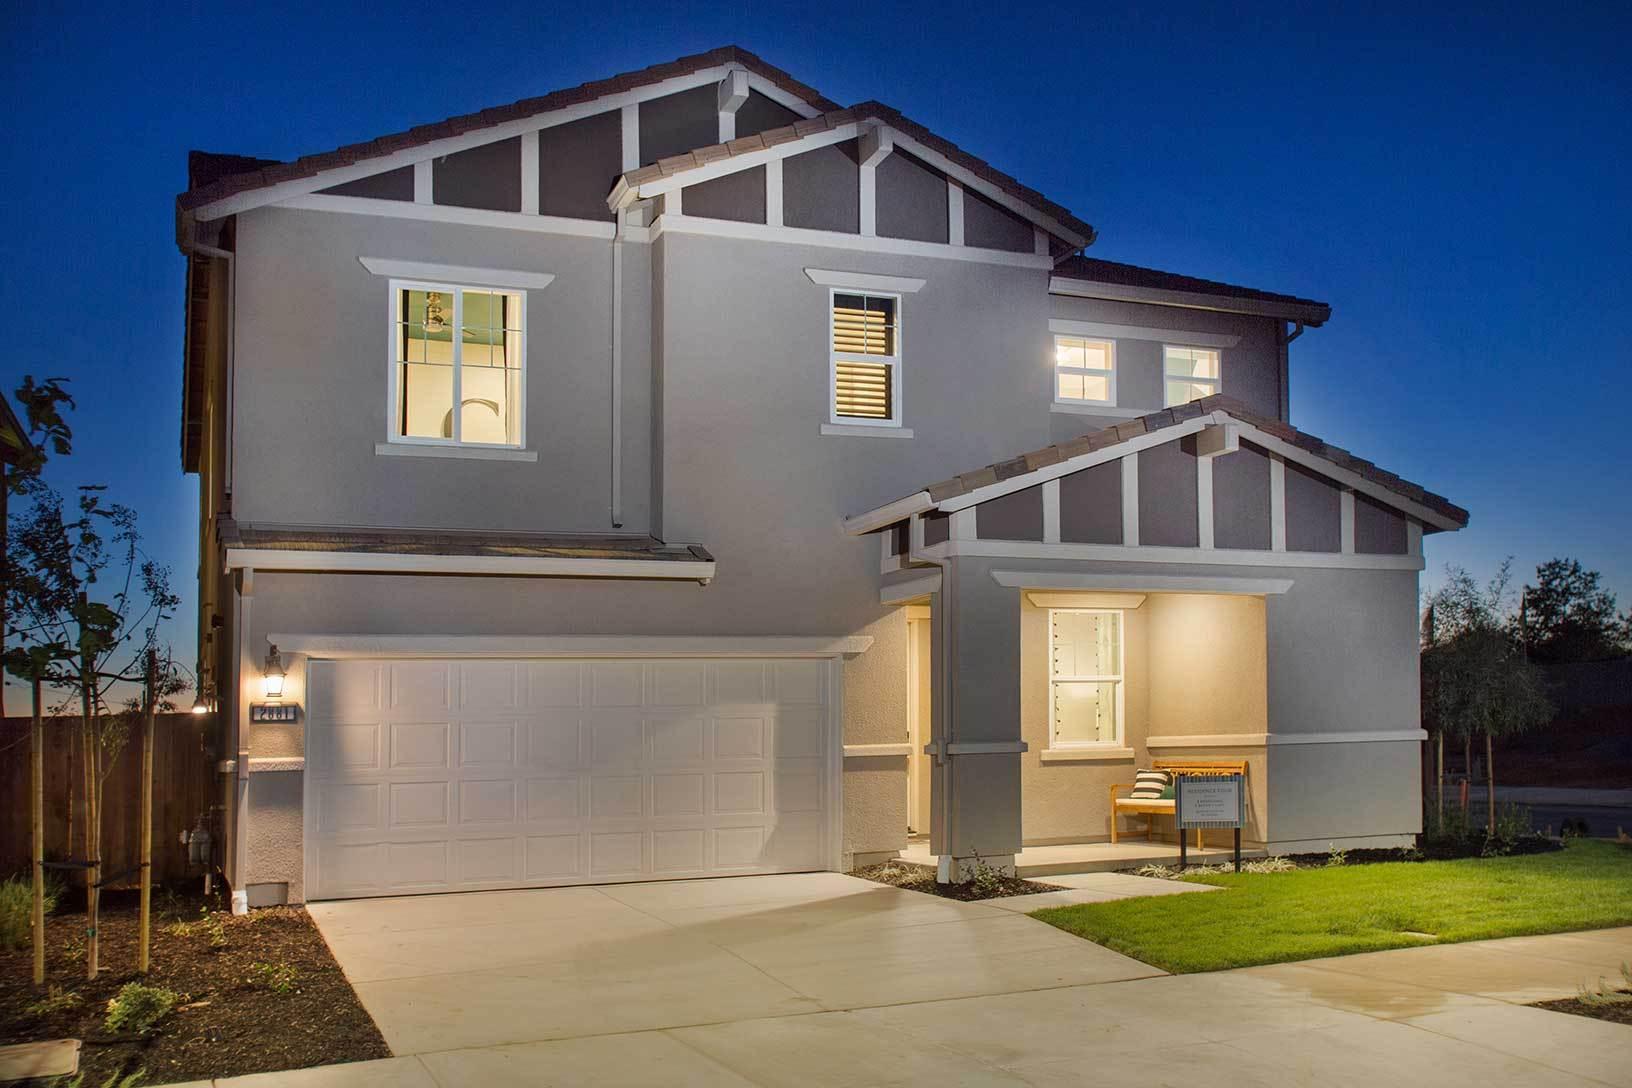 TPH-residence-TPH_NC_Lantana_P4_Exterior-1:Plan 4